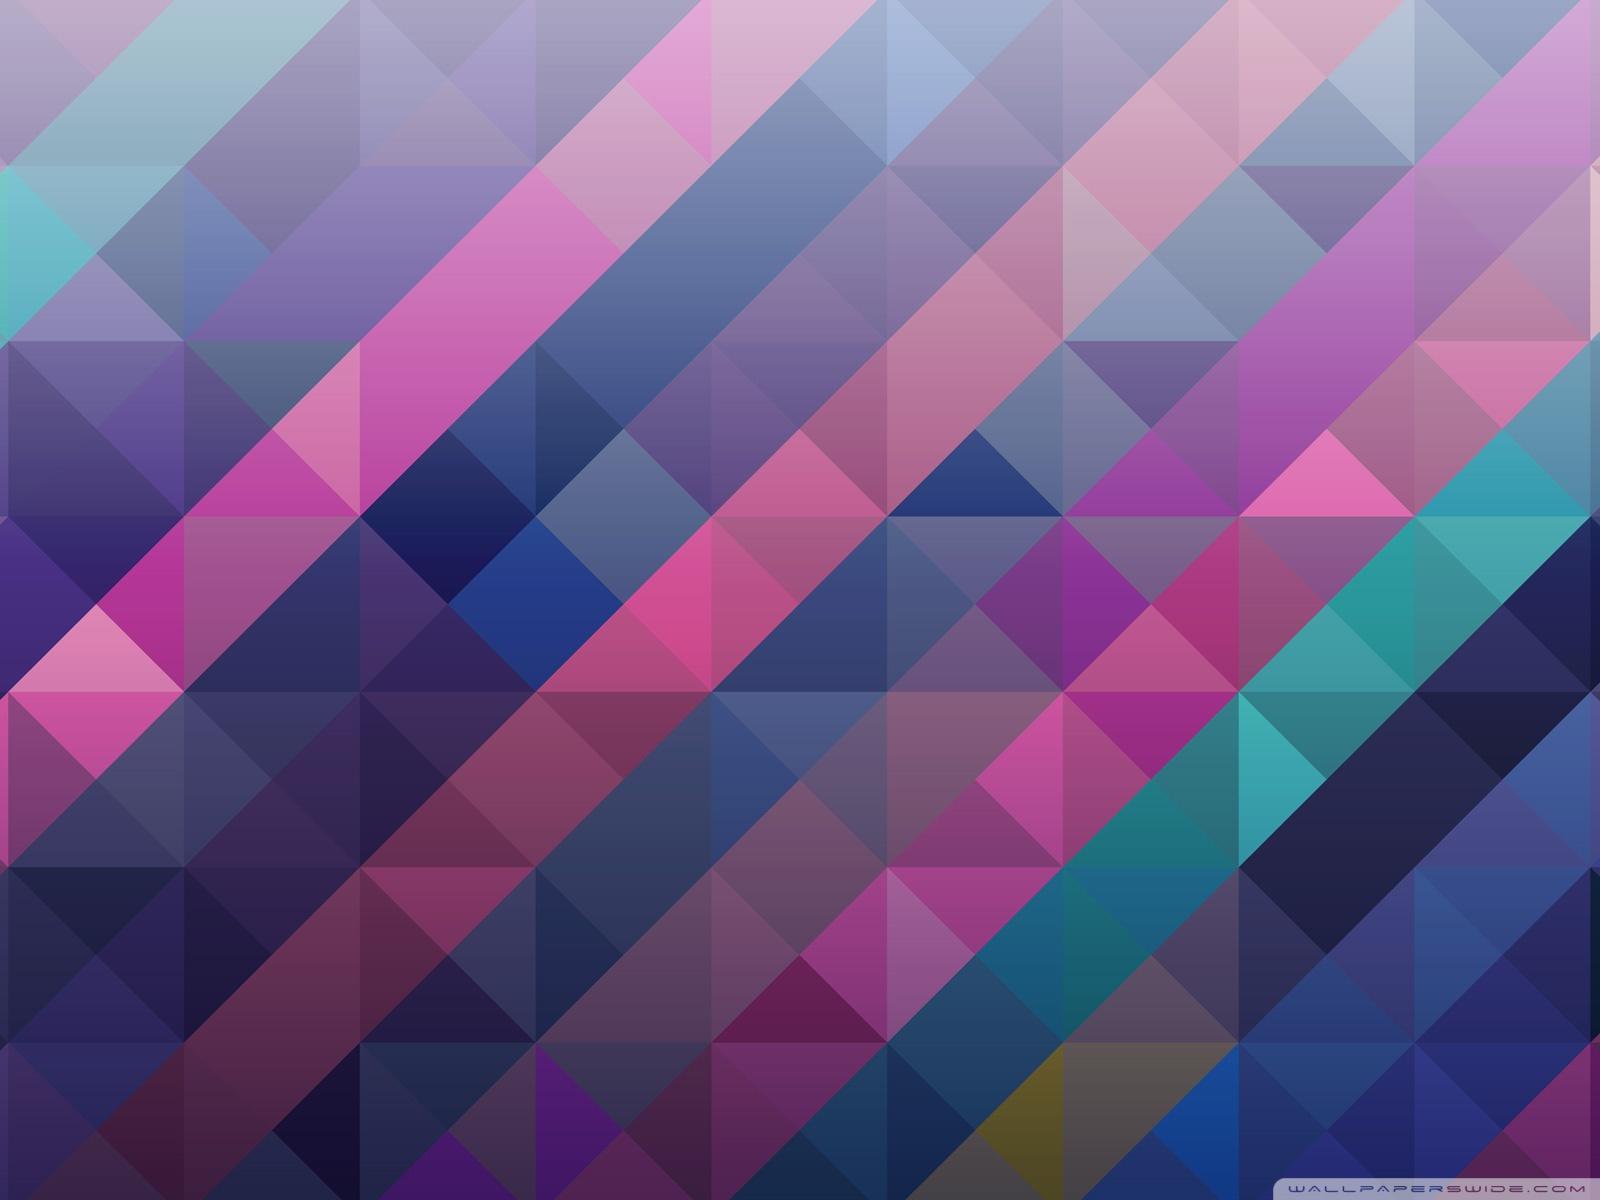 Free Abstract Wallpaper phone wallpaper by baller1416